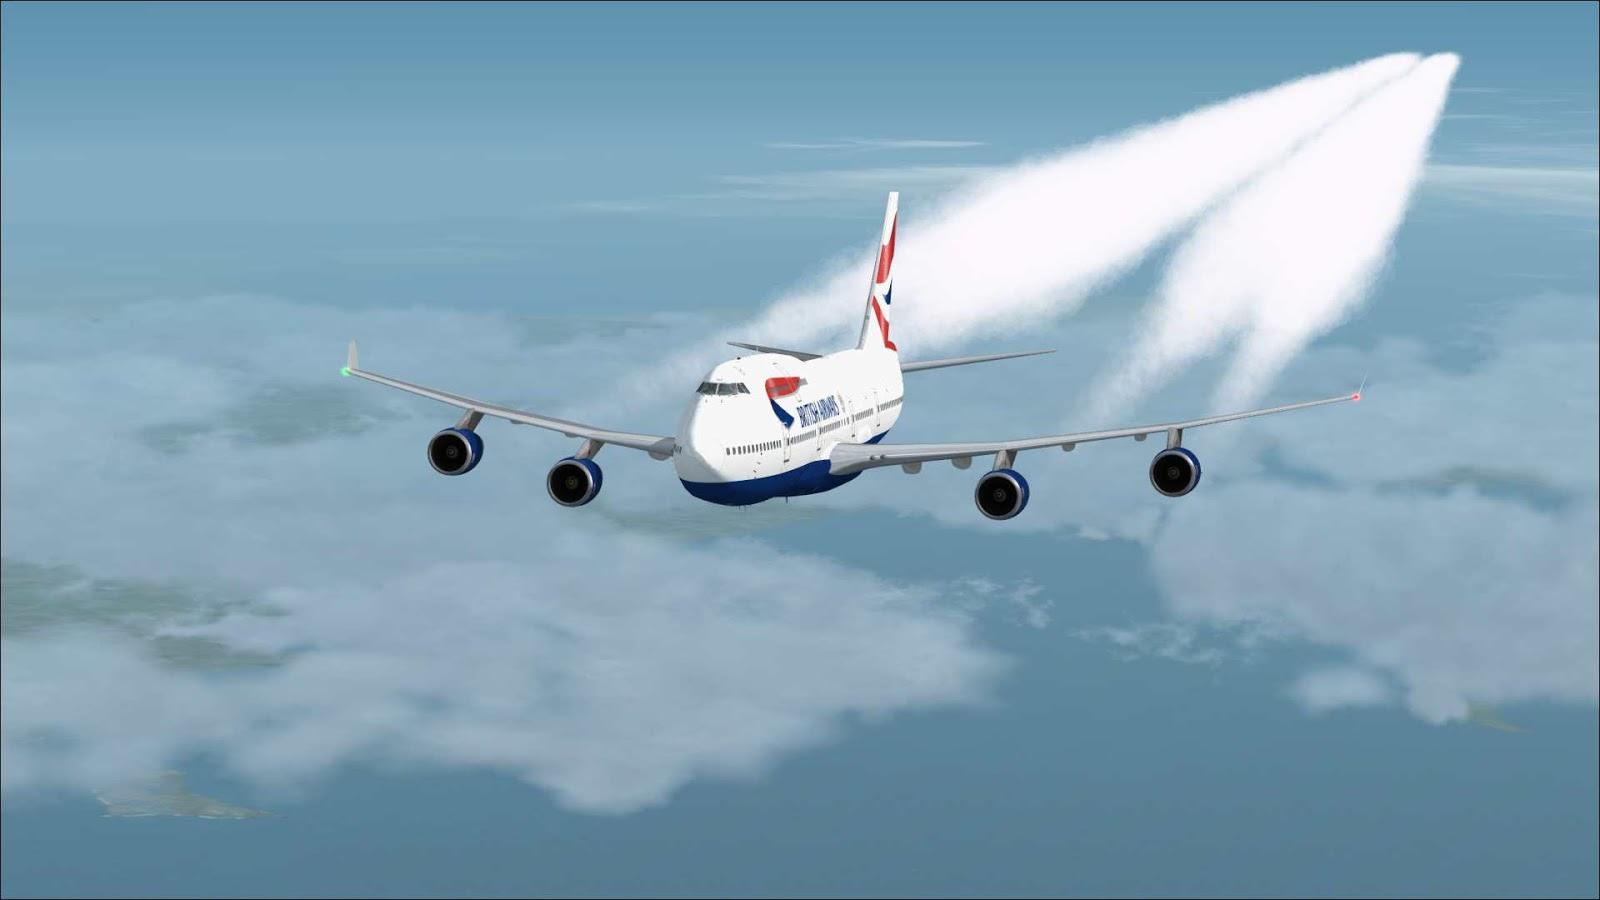 South West Flight Simulation: A Short Tale of Contrails